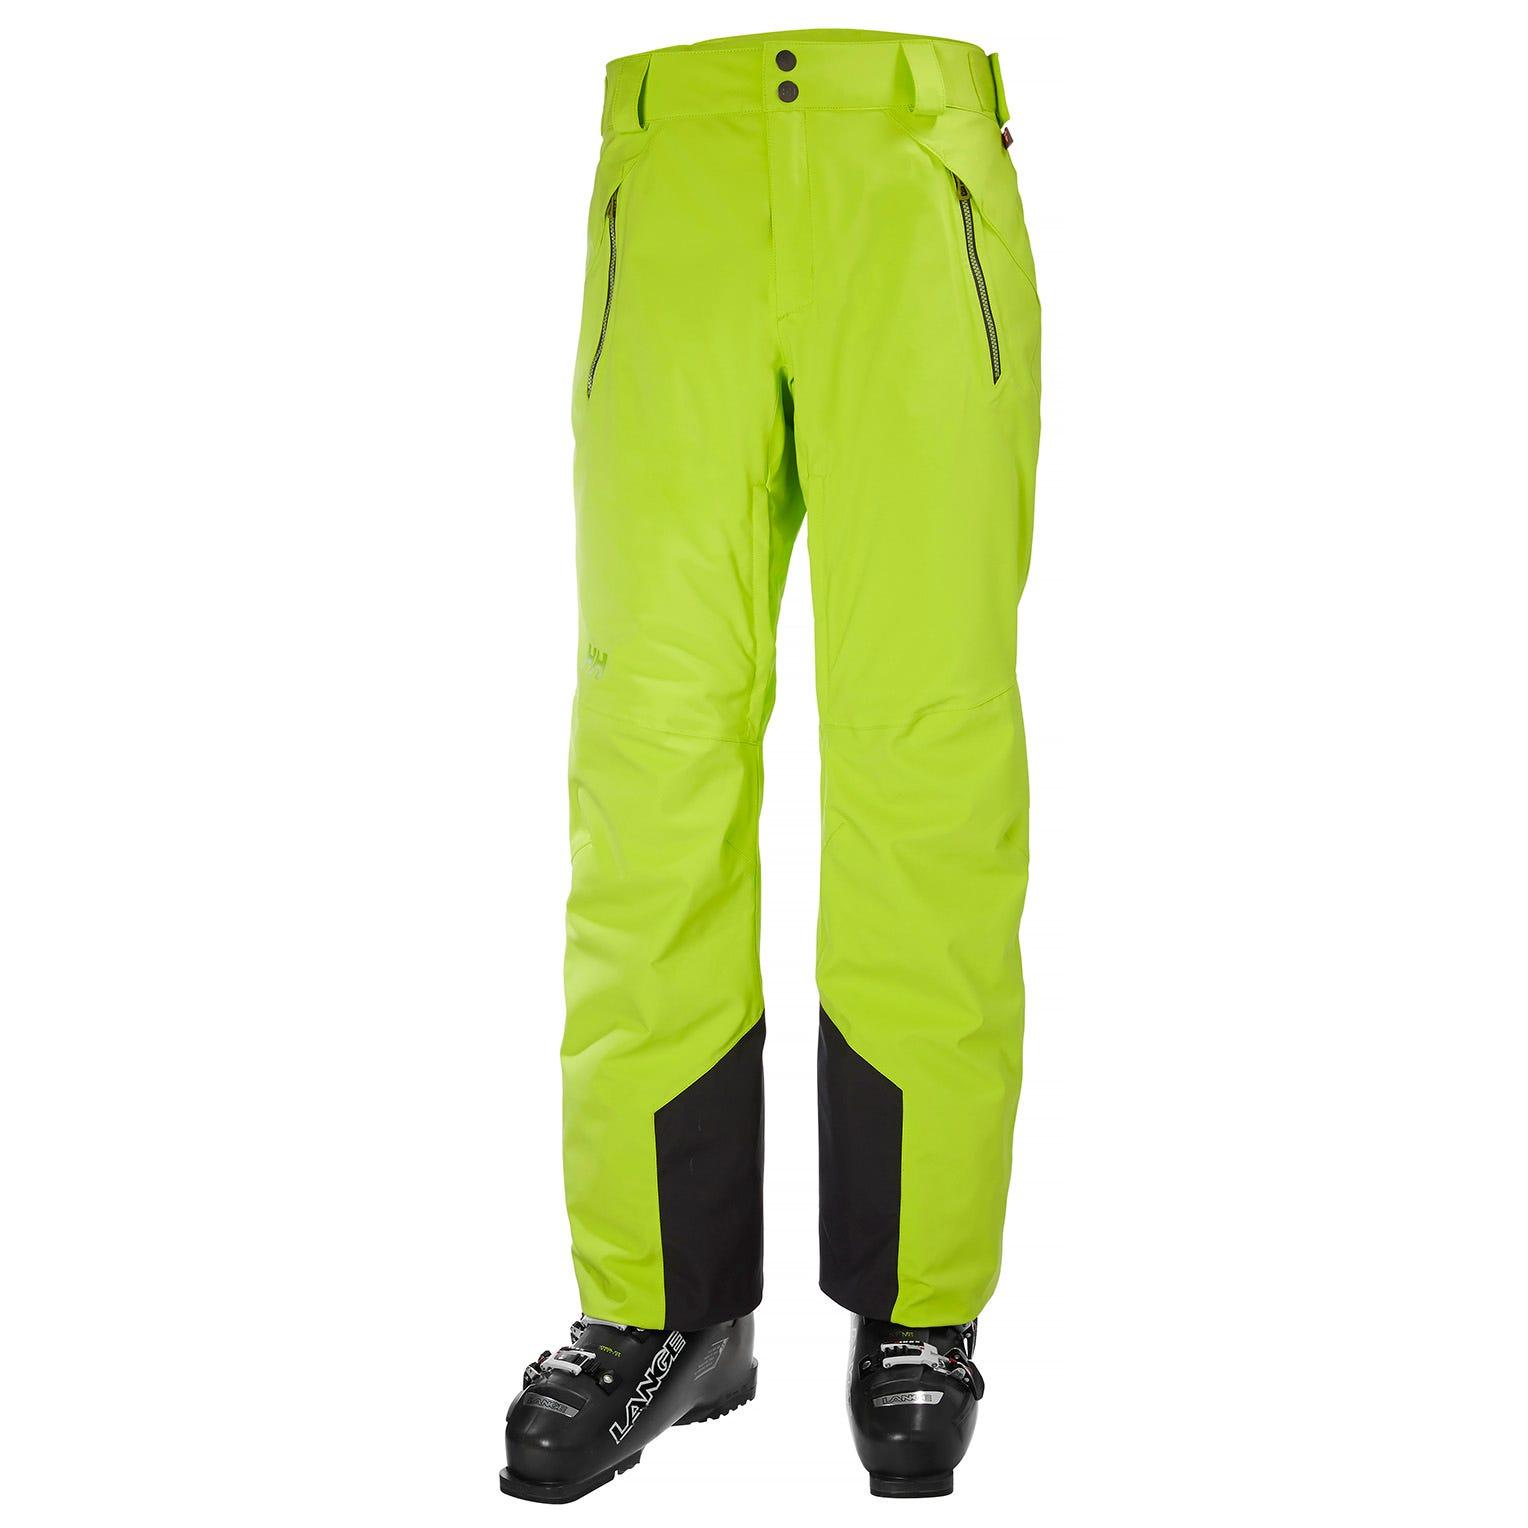 Helly Hansen Force Pant Mens Ski Yellow XL